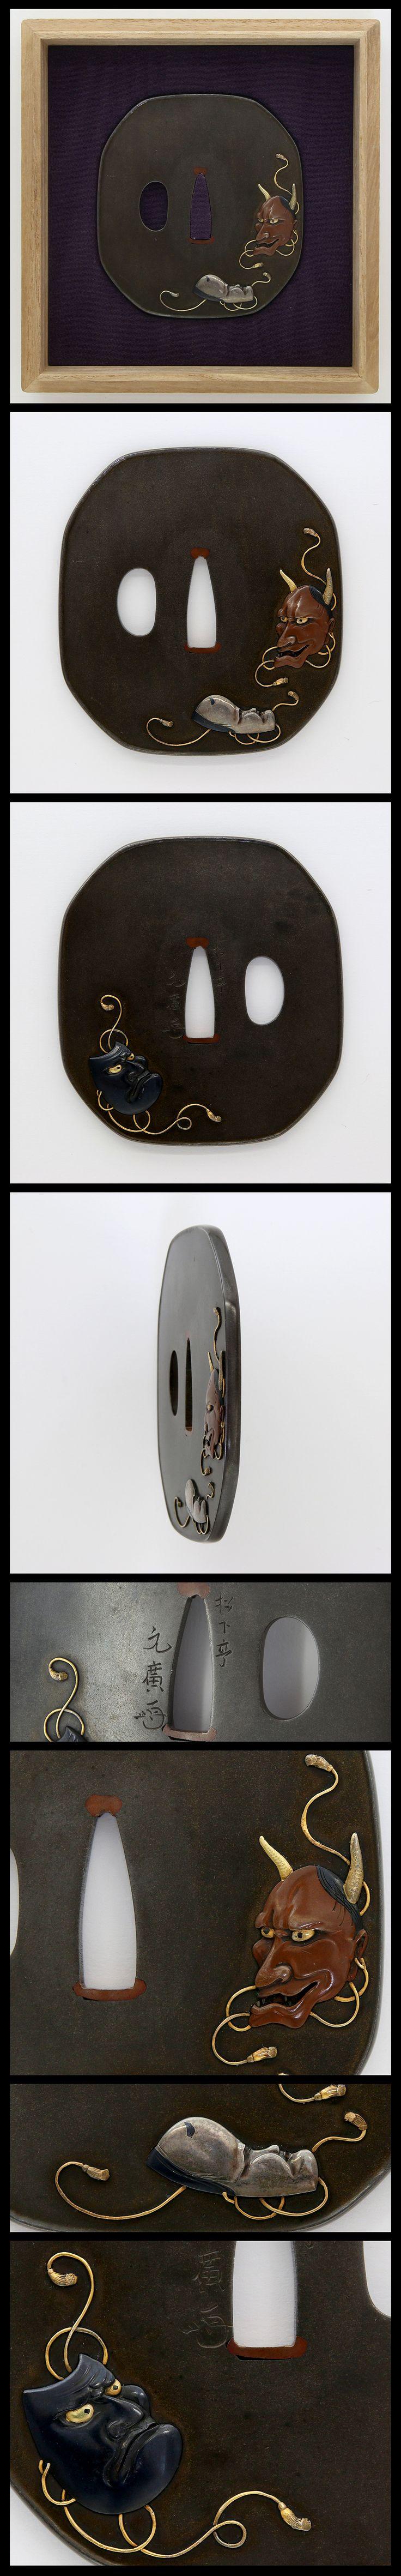 Edo On octagon silver polished Tsuba, Japanese Nou masks (Hannya, Okame and Beshimi) are engraved with gold, silver, Shakudo and Suaka color.